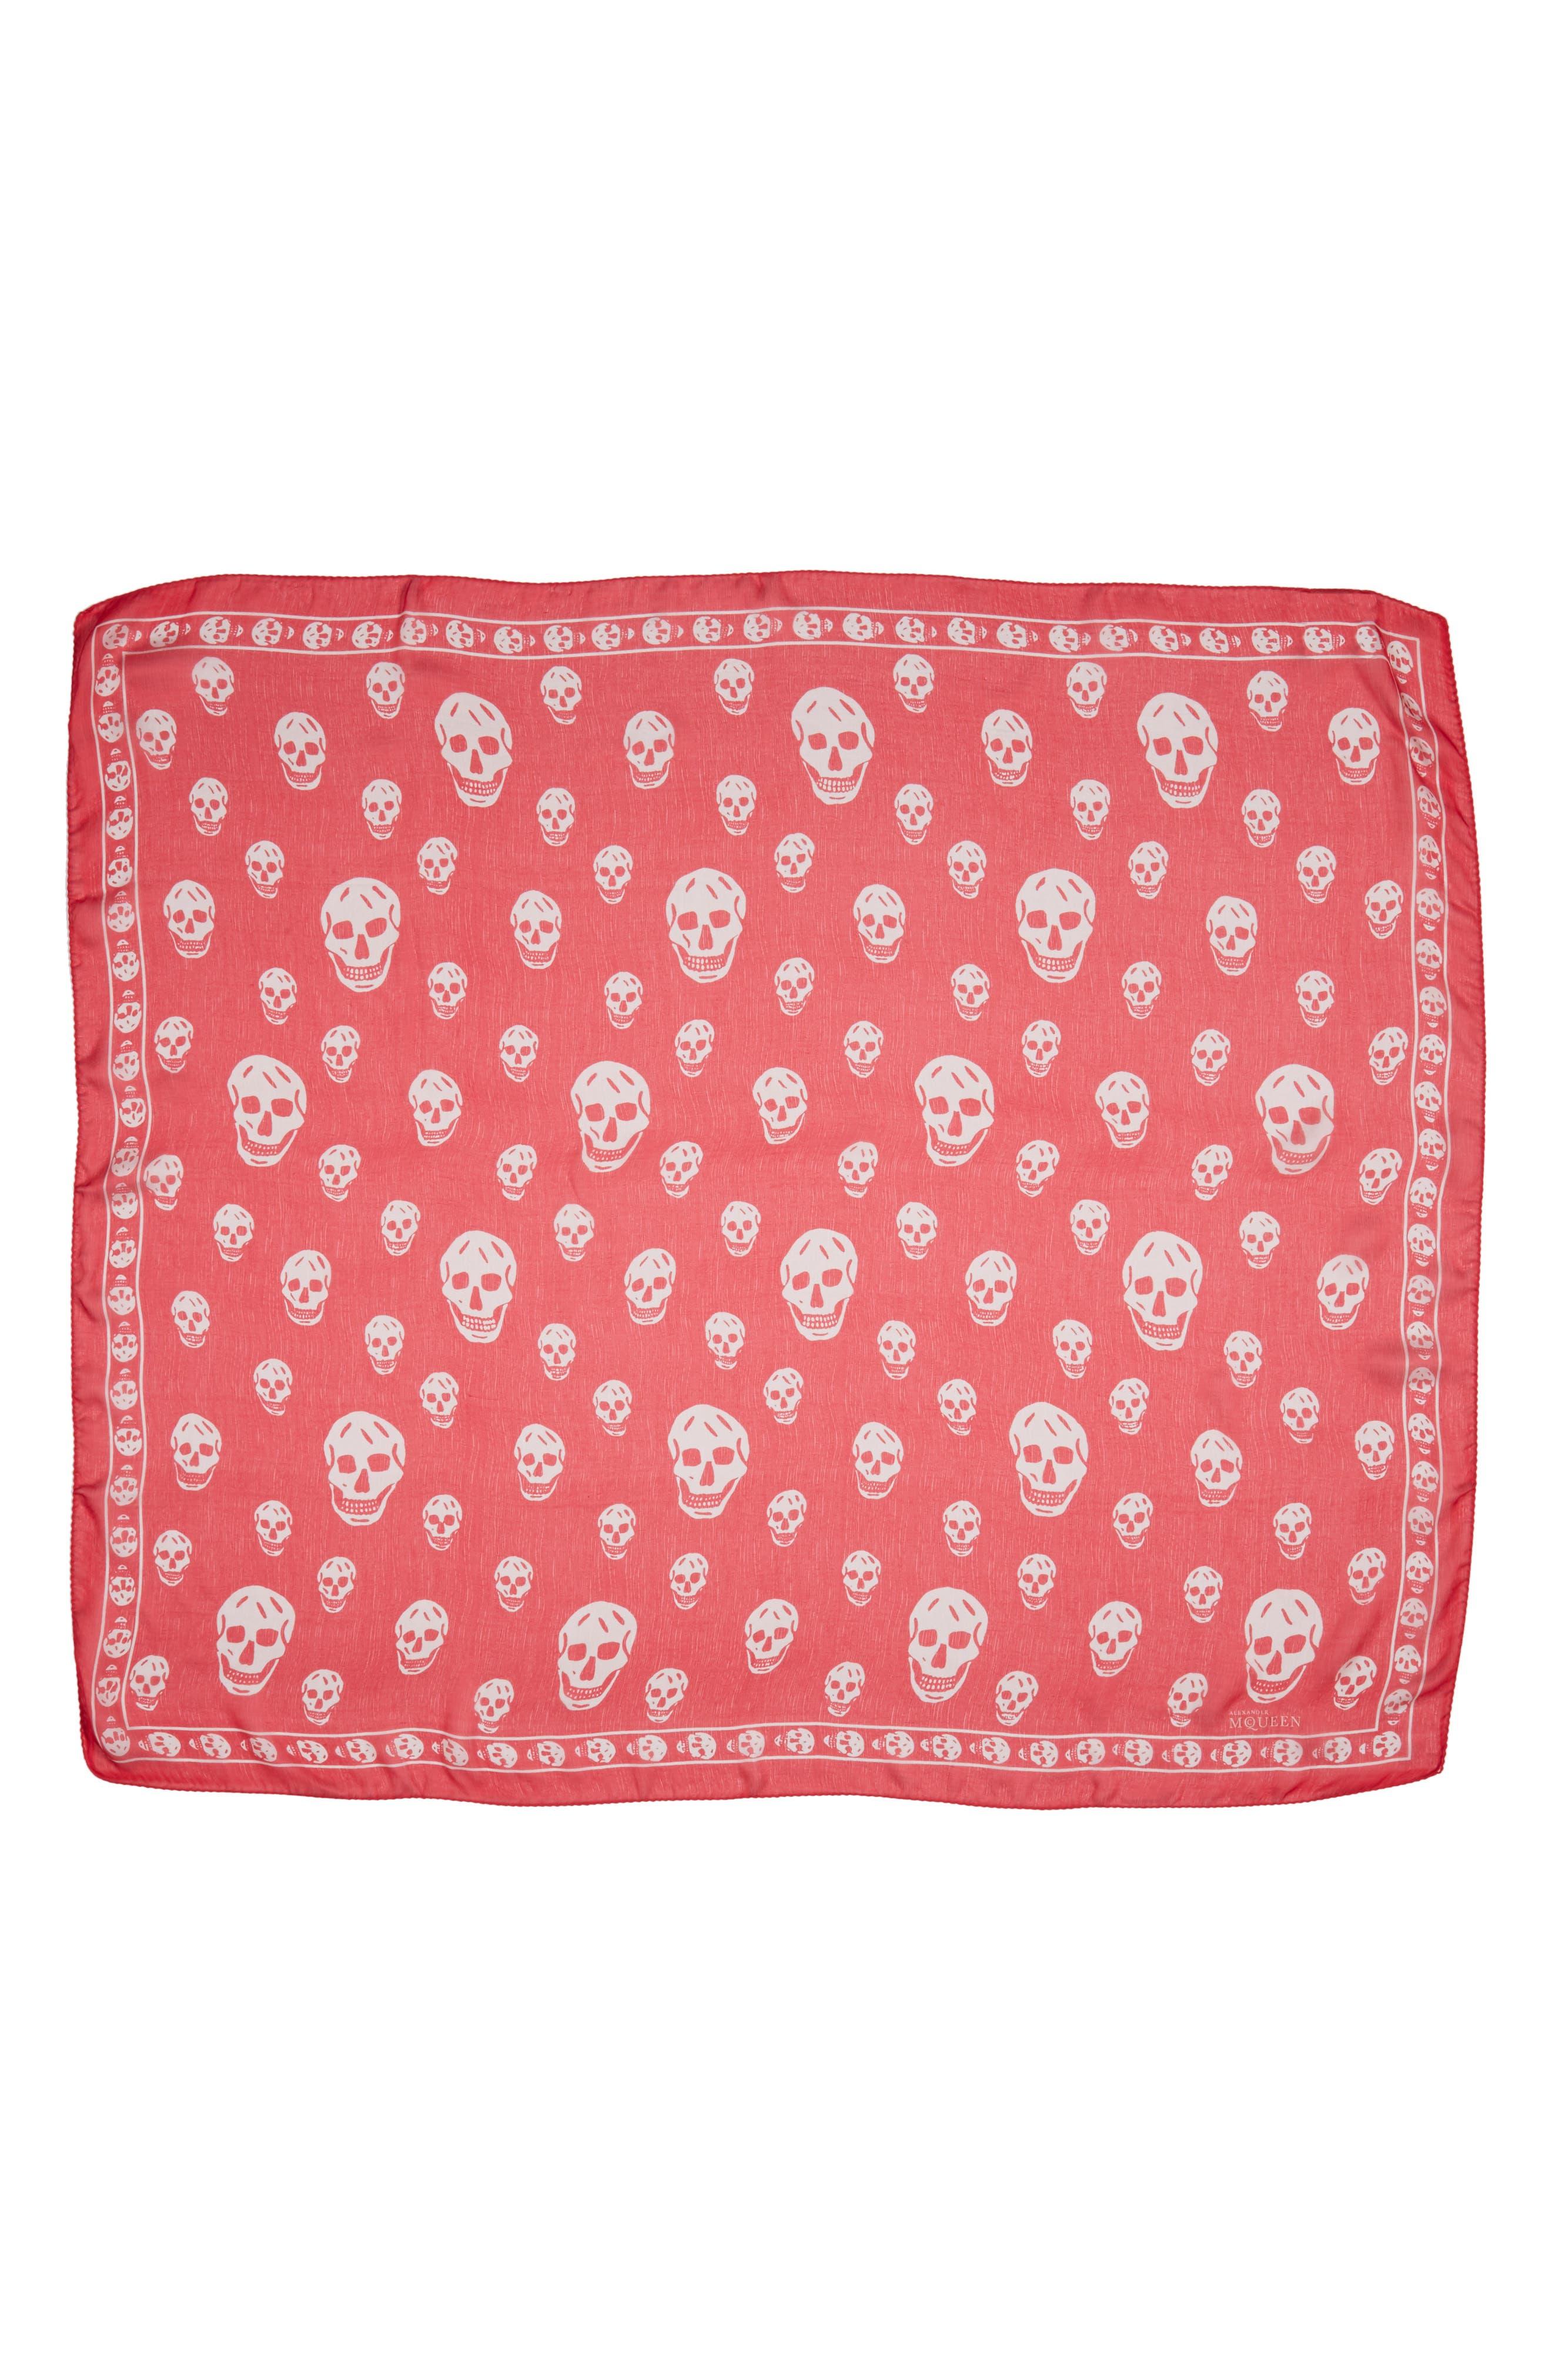 ALEXANDER MCQUEEN 'Skull' Chiffon Scarf, Main, color, 608